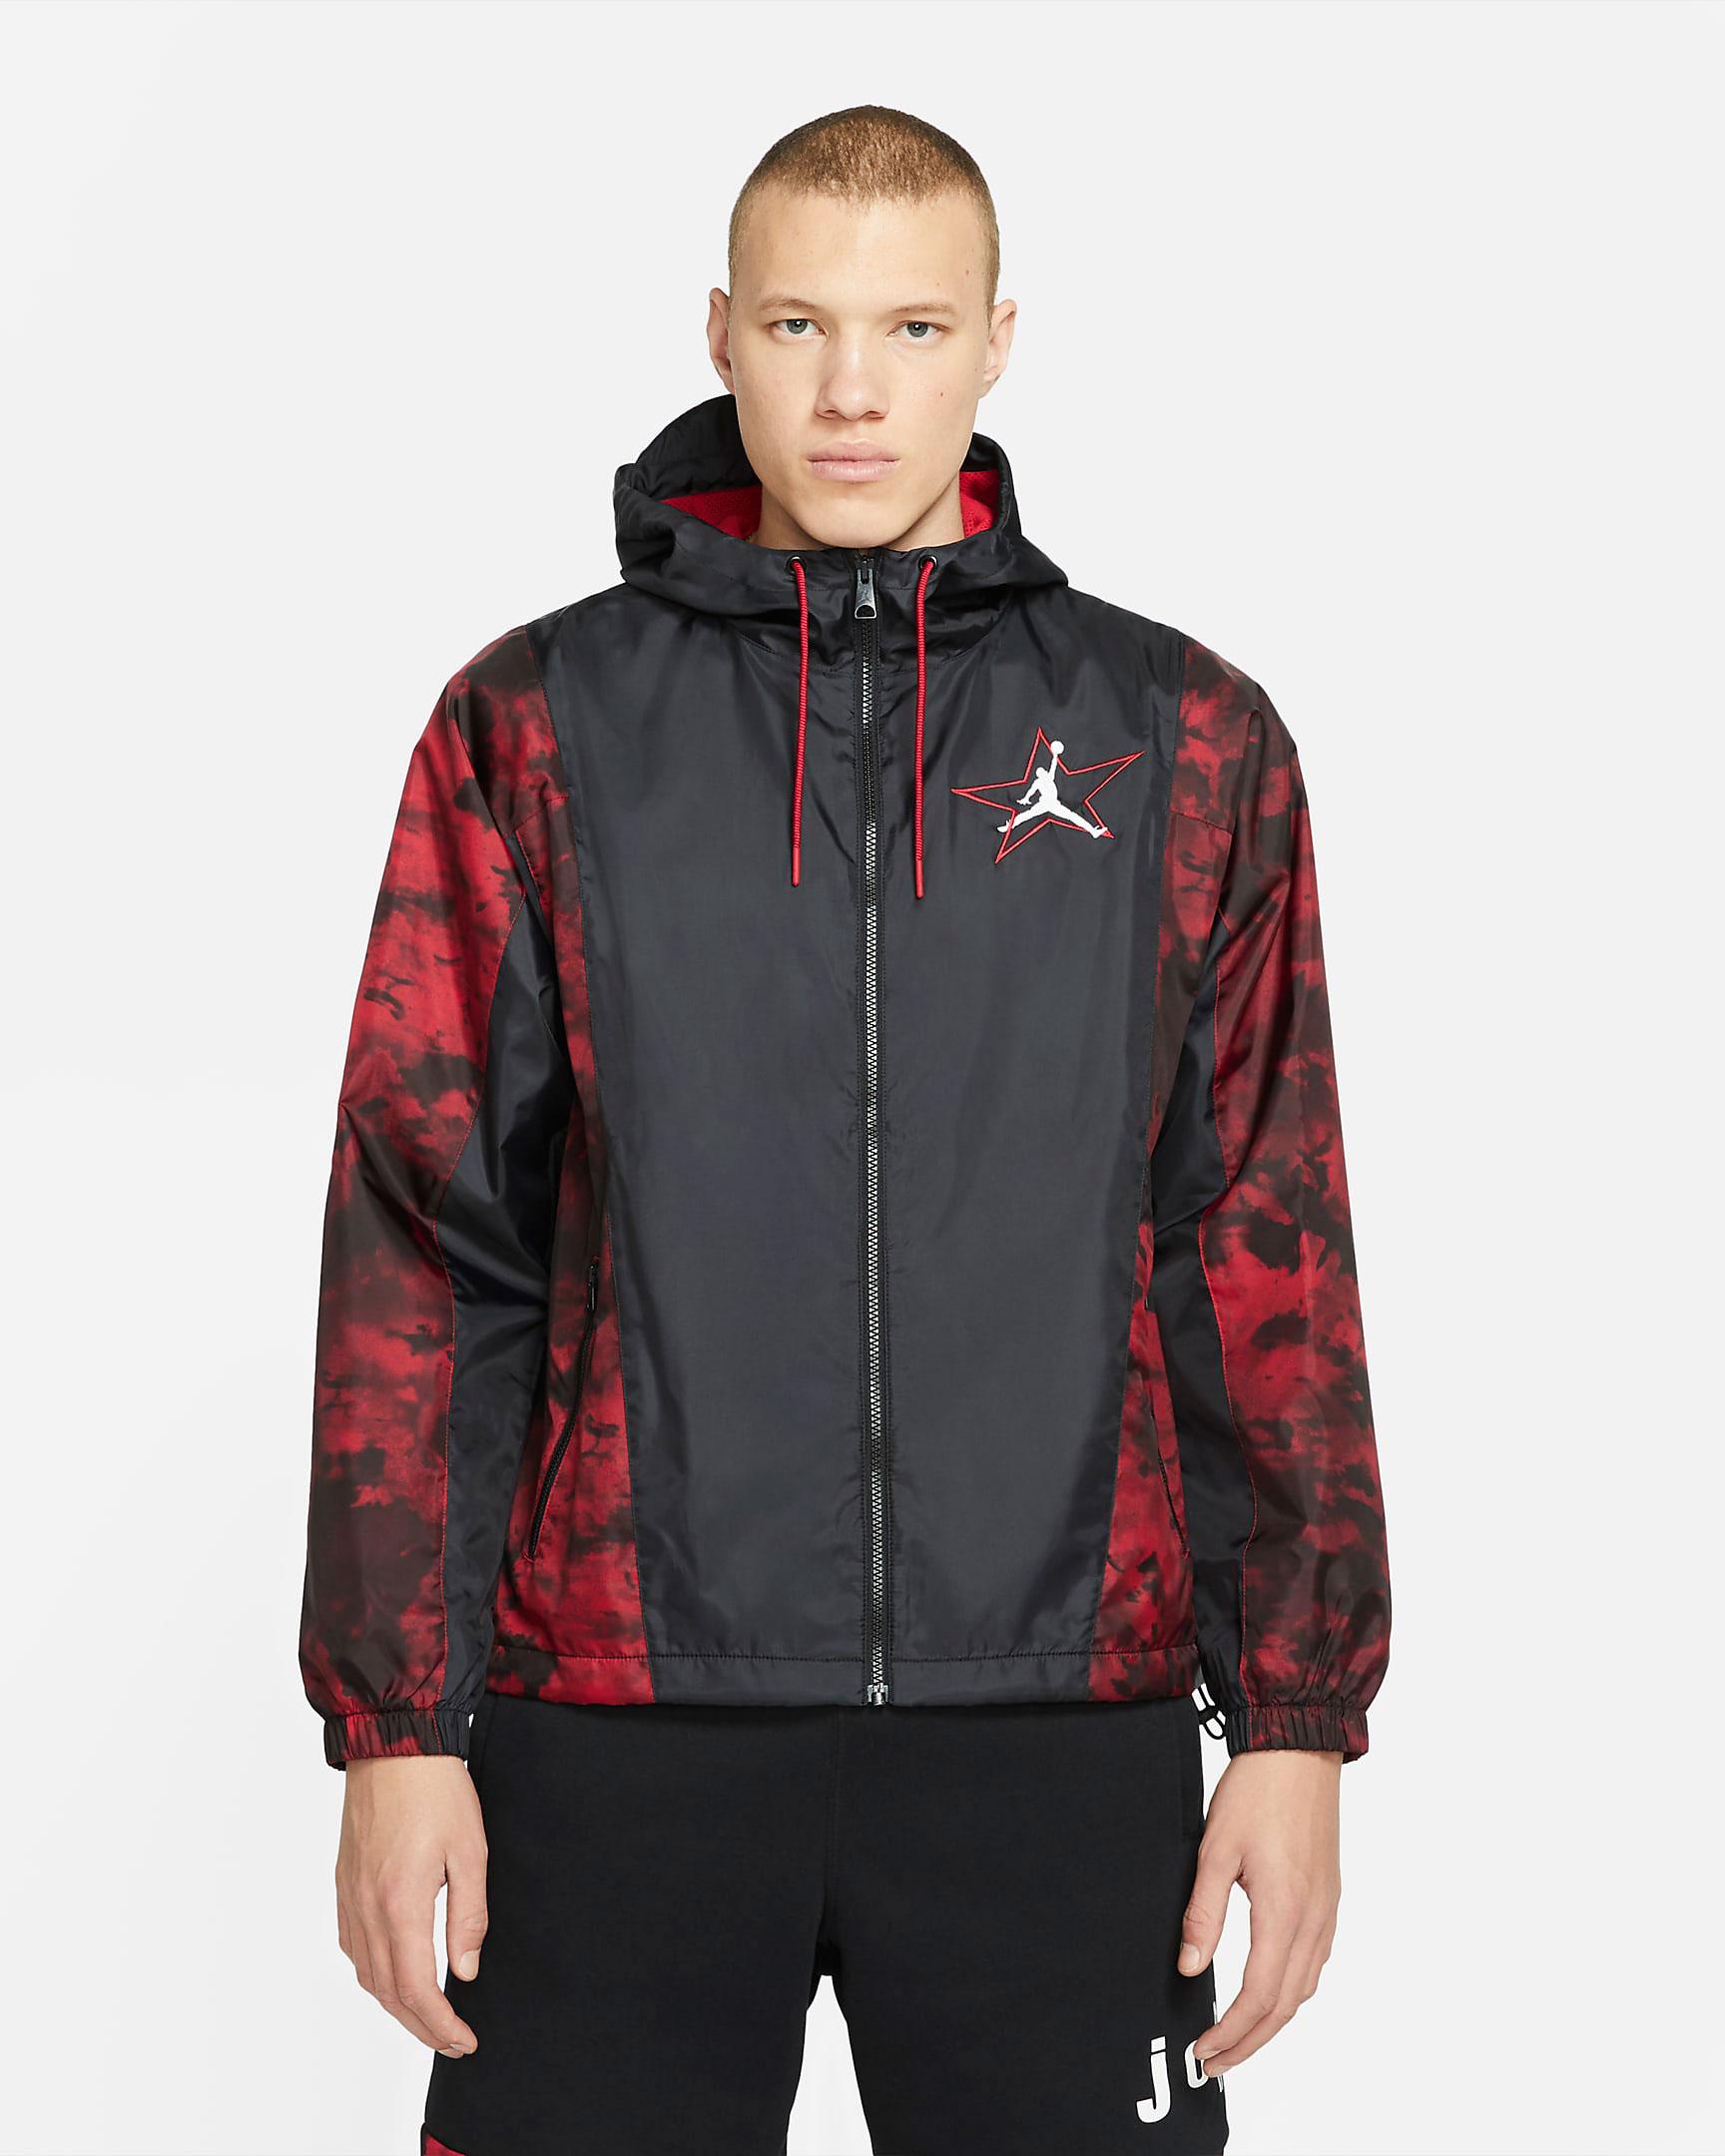 carmine-jordan-6-jacket-1